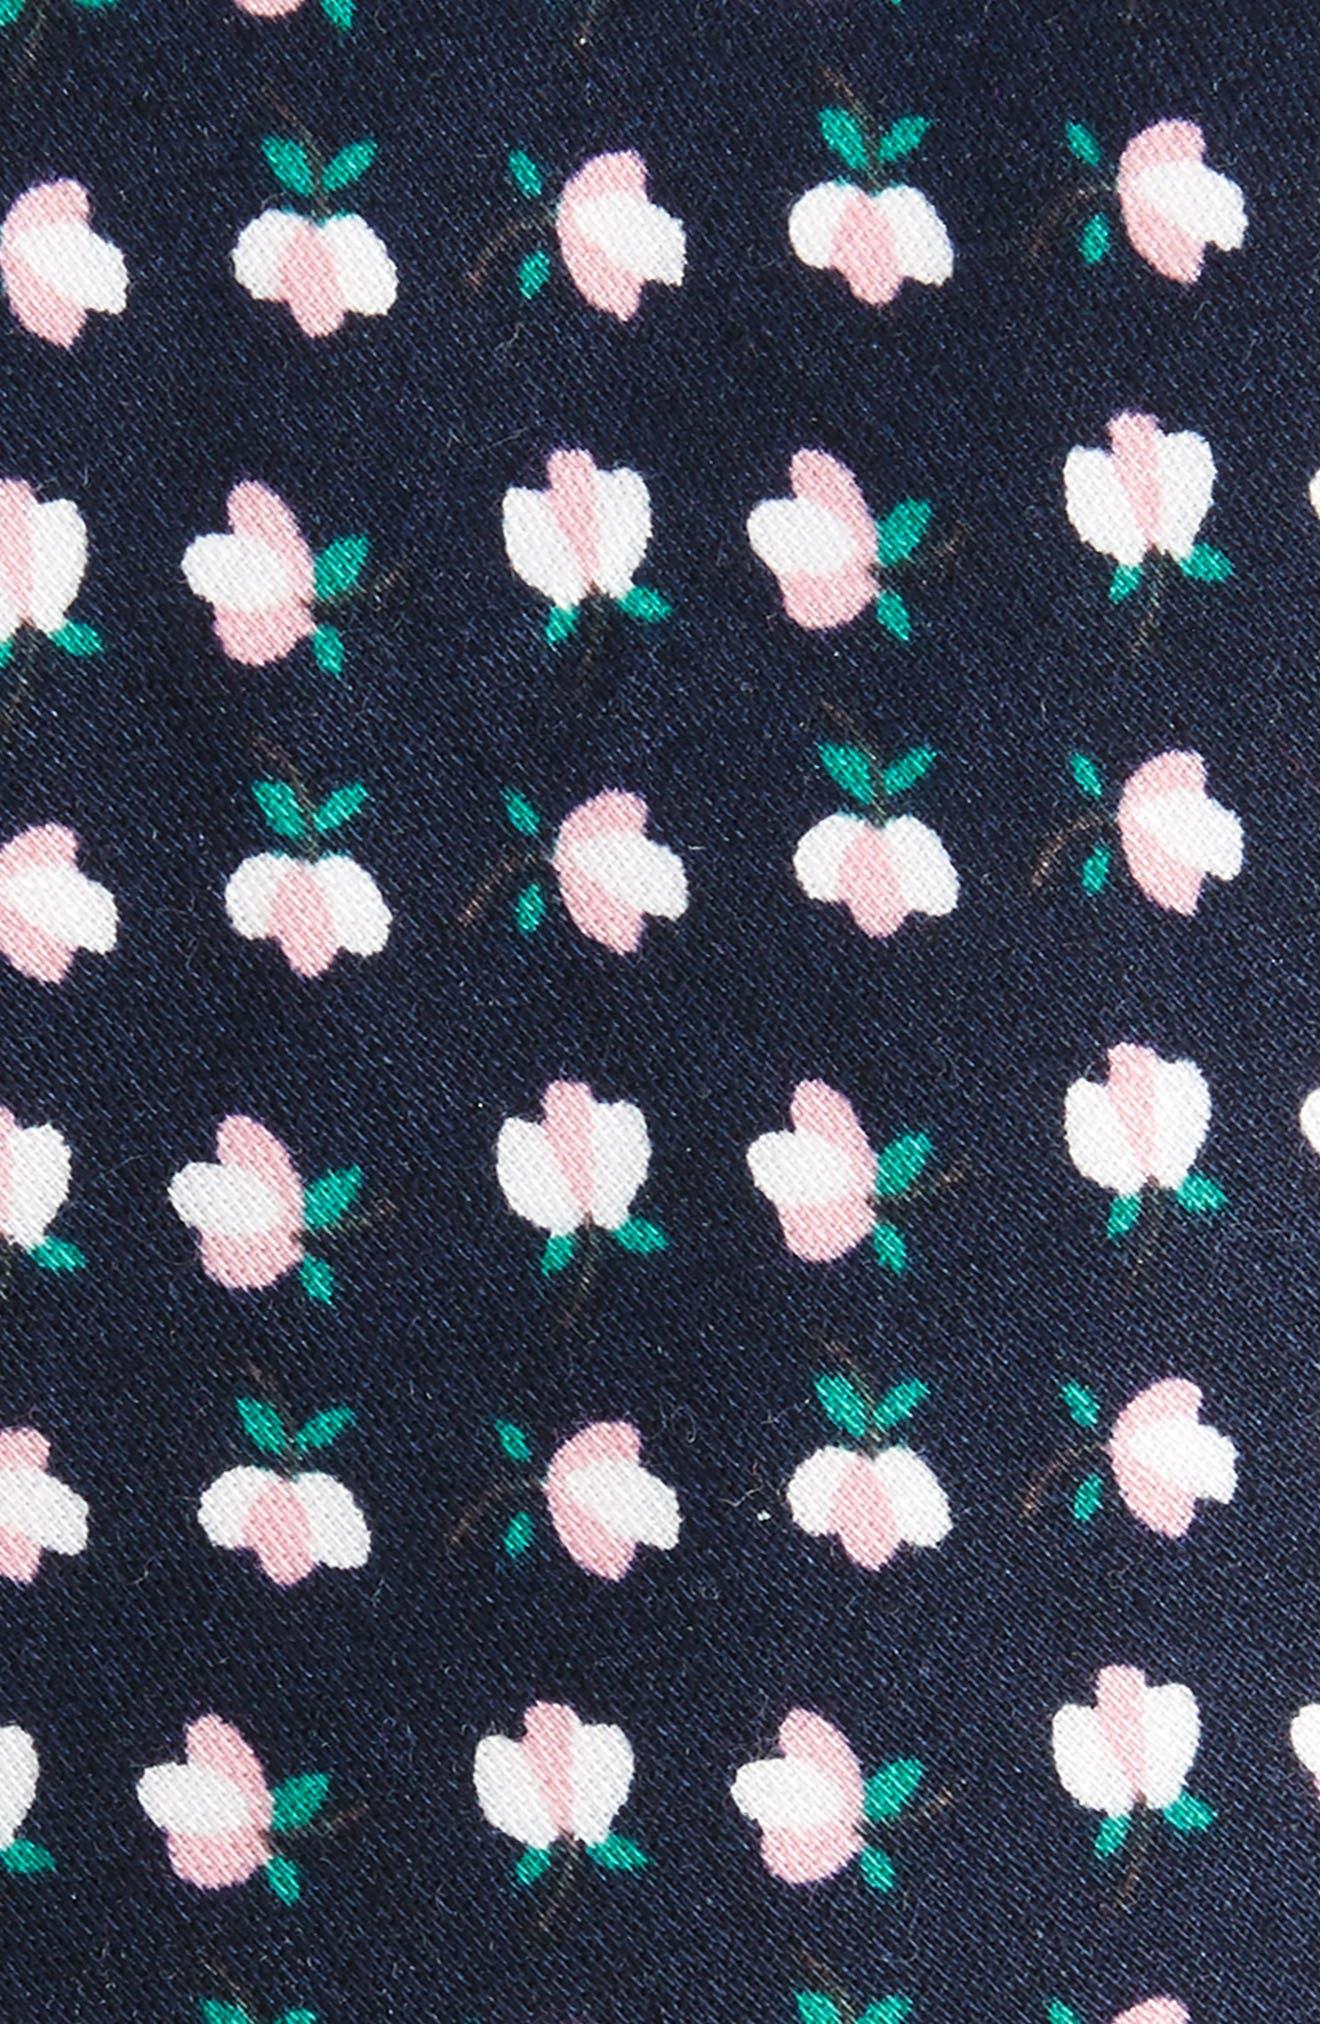 Rufford Mini Floral Cotton Tie,                             Alternate thumbnail 2, color,                             Navy